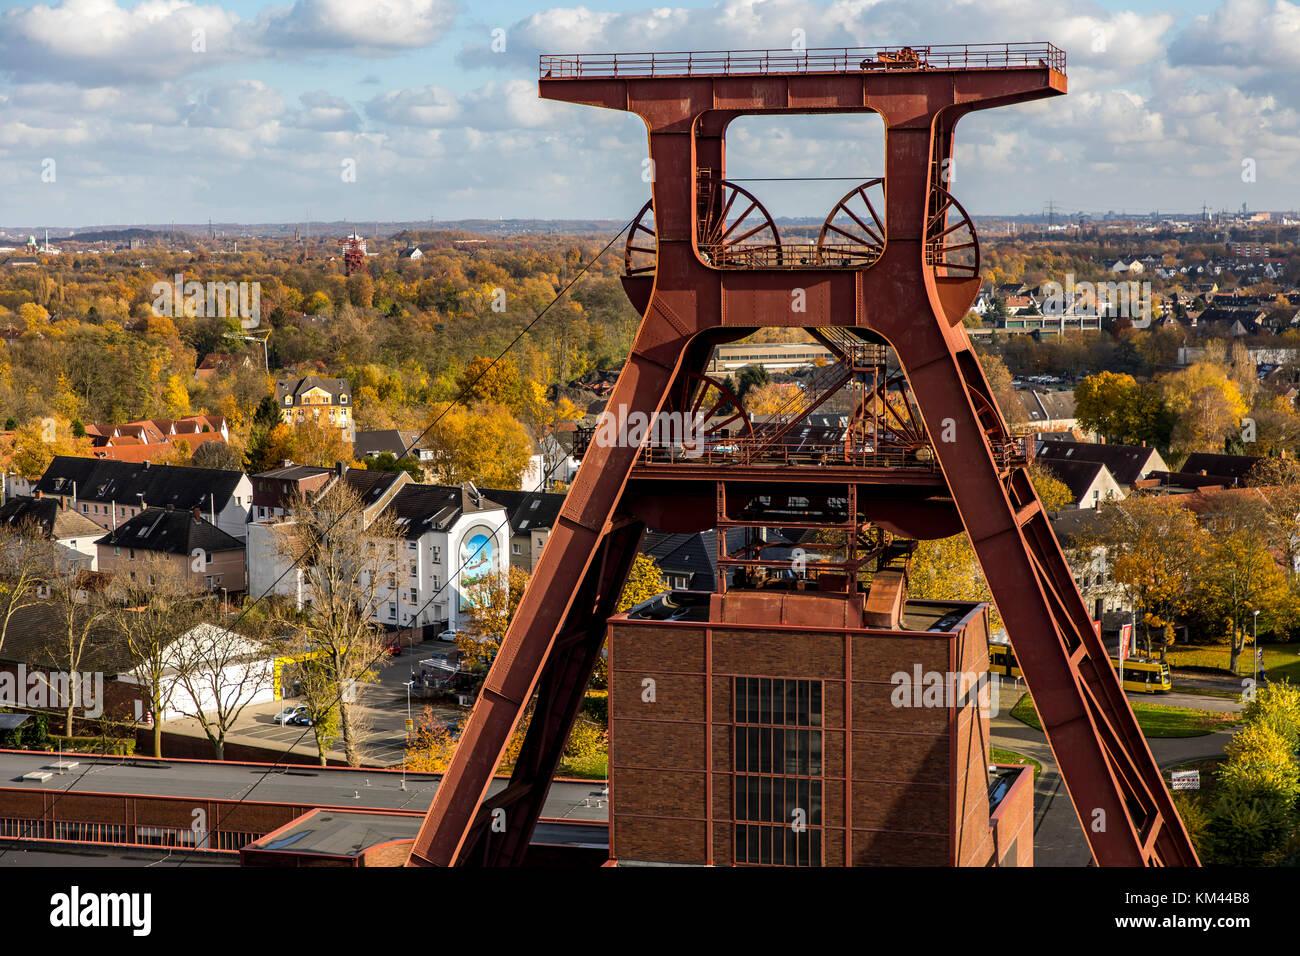 Winding tower of  Zeche Zollverein colliery in Essen, Germany, world heritage site, - Stock Image